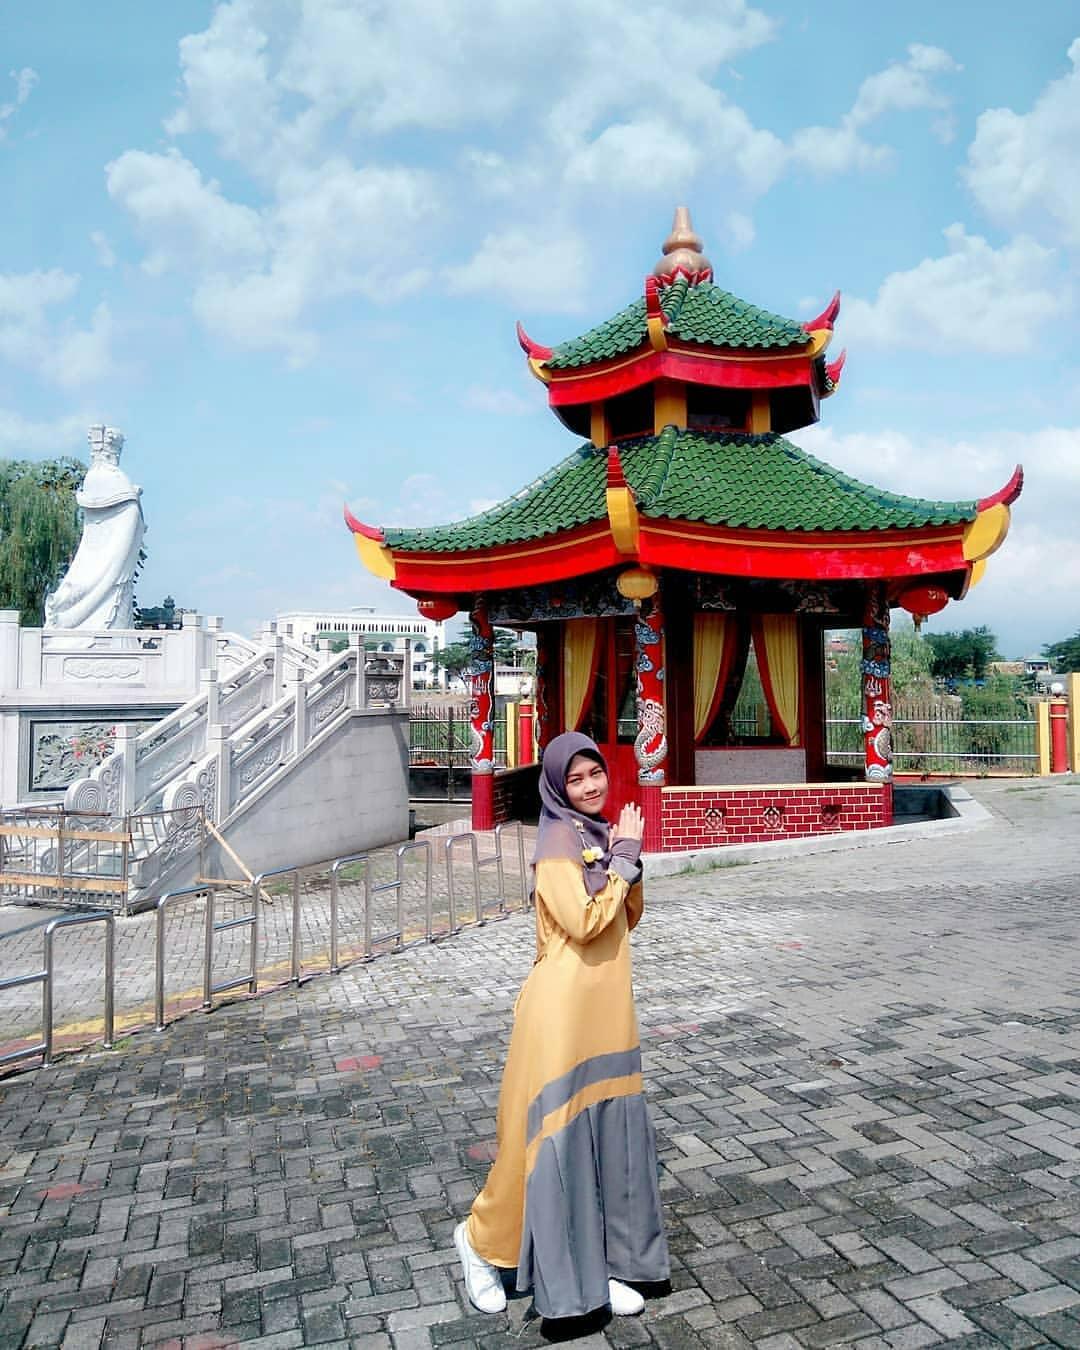 Kediriimages Instagram Foto Capture Kediri Klenteng Tjoe Hwie Kiong Jawa